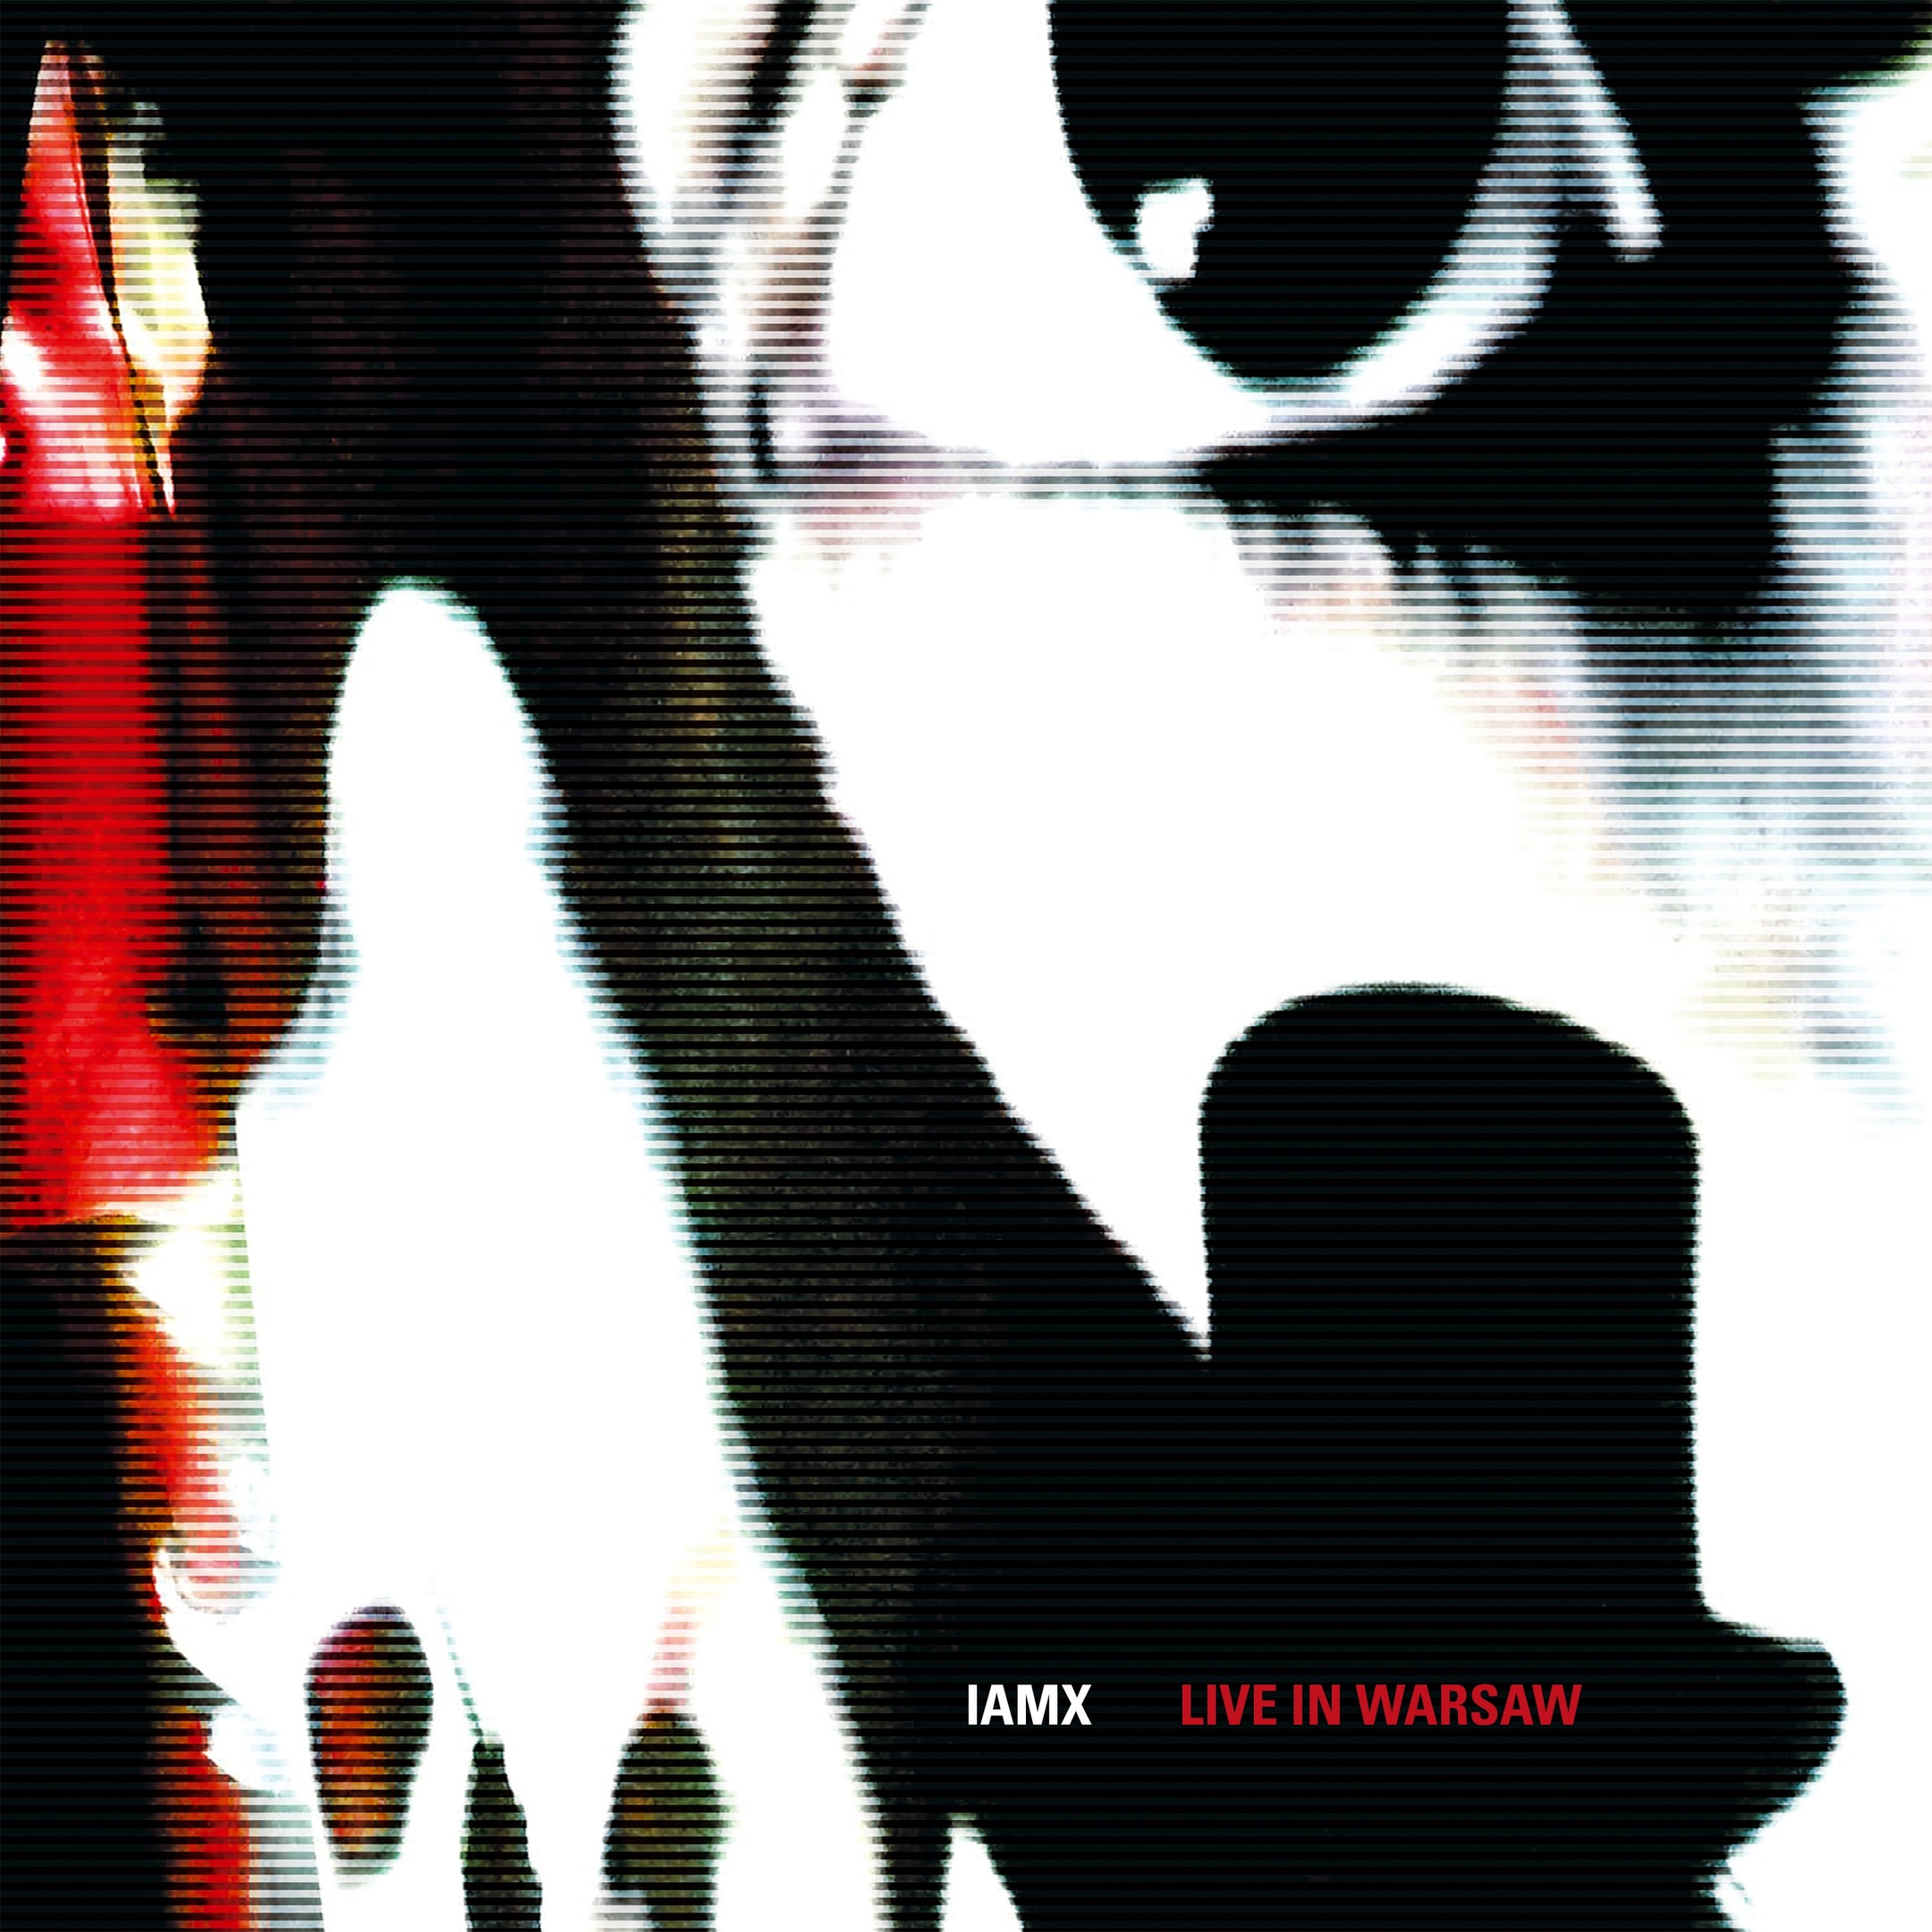 IAMX album Live in Warsaw